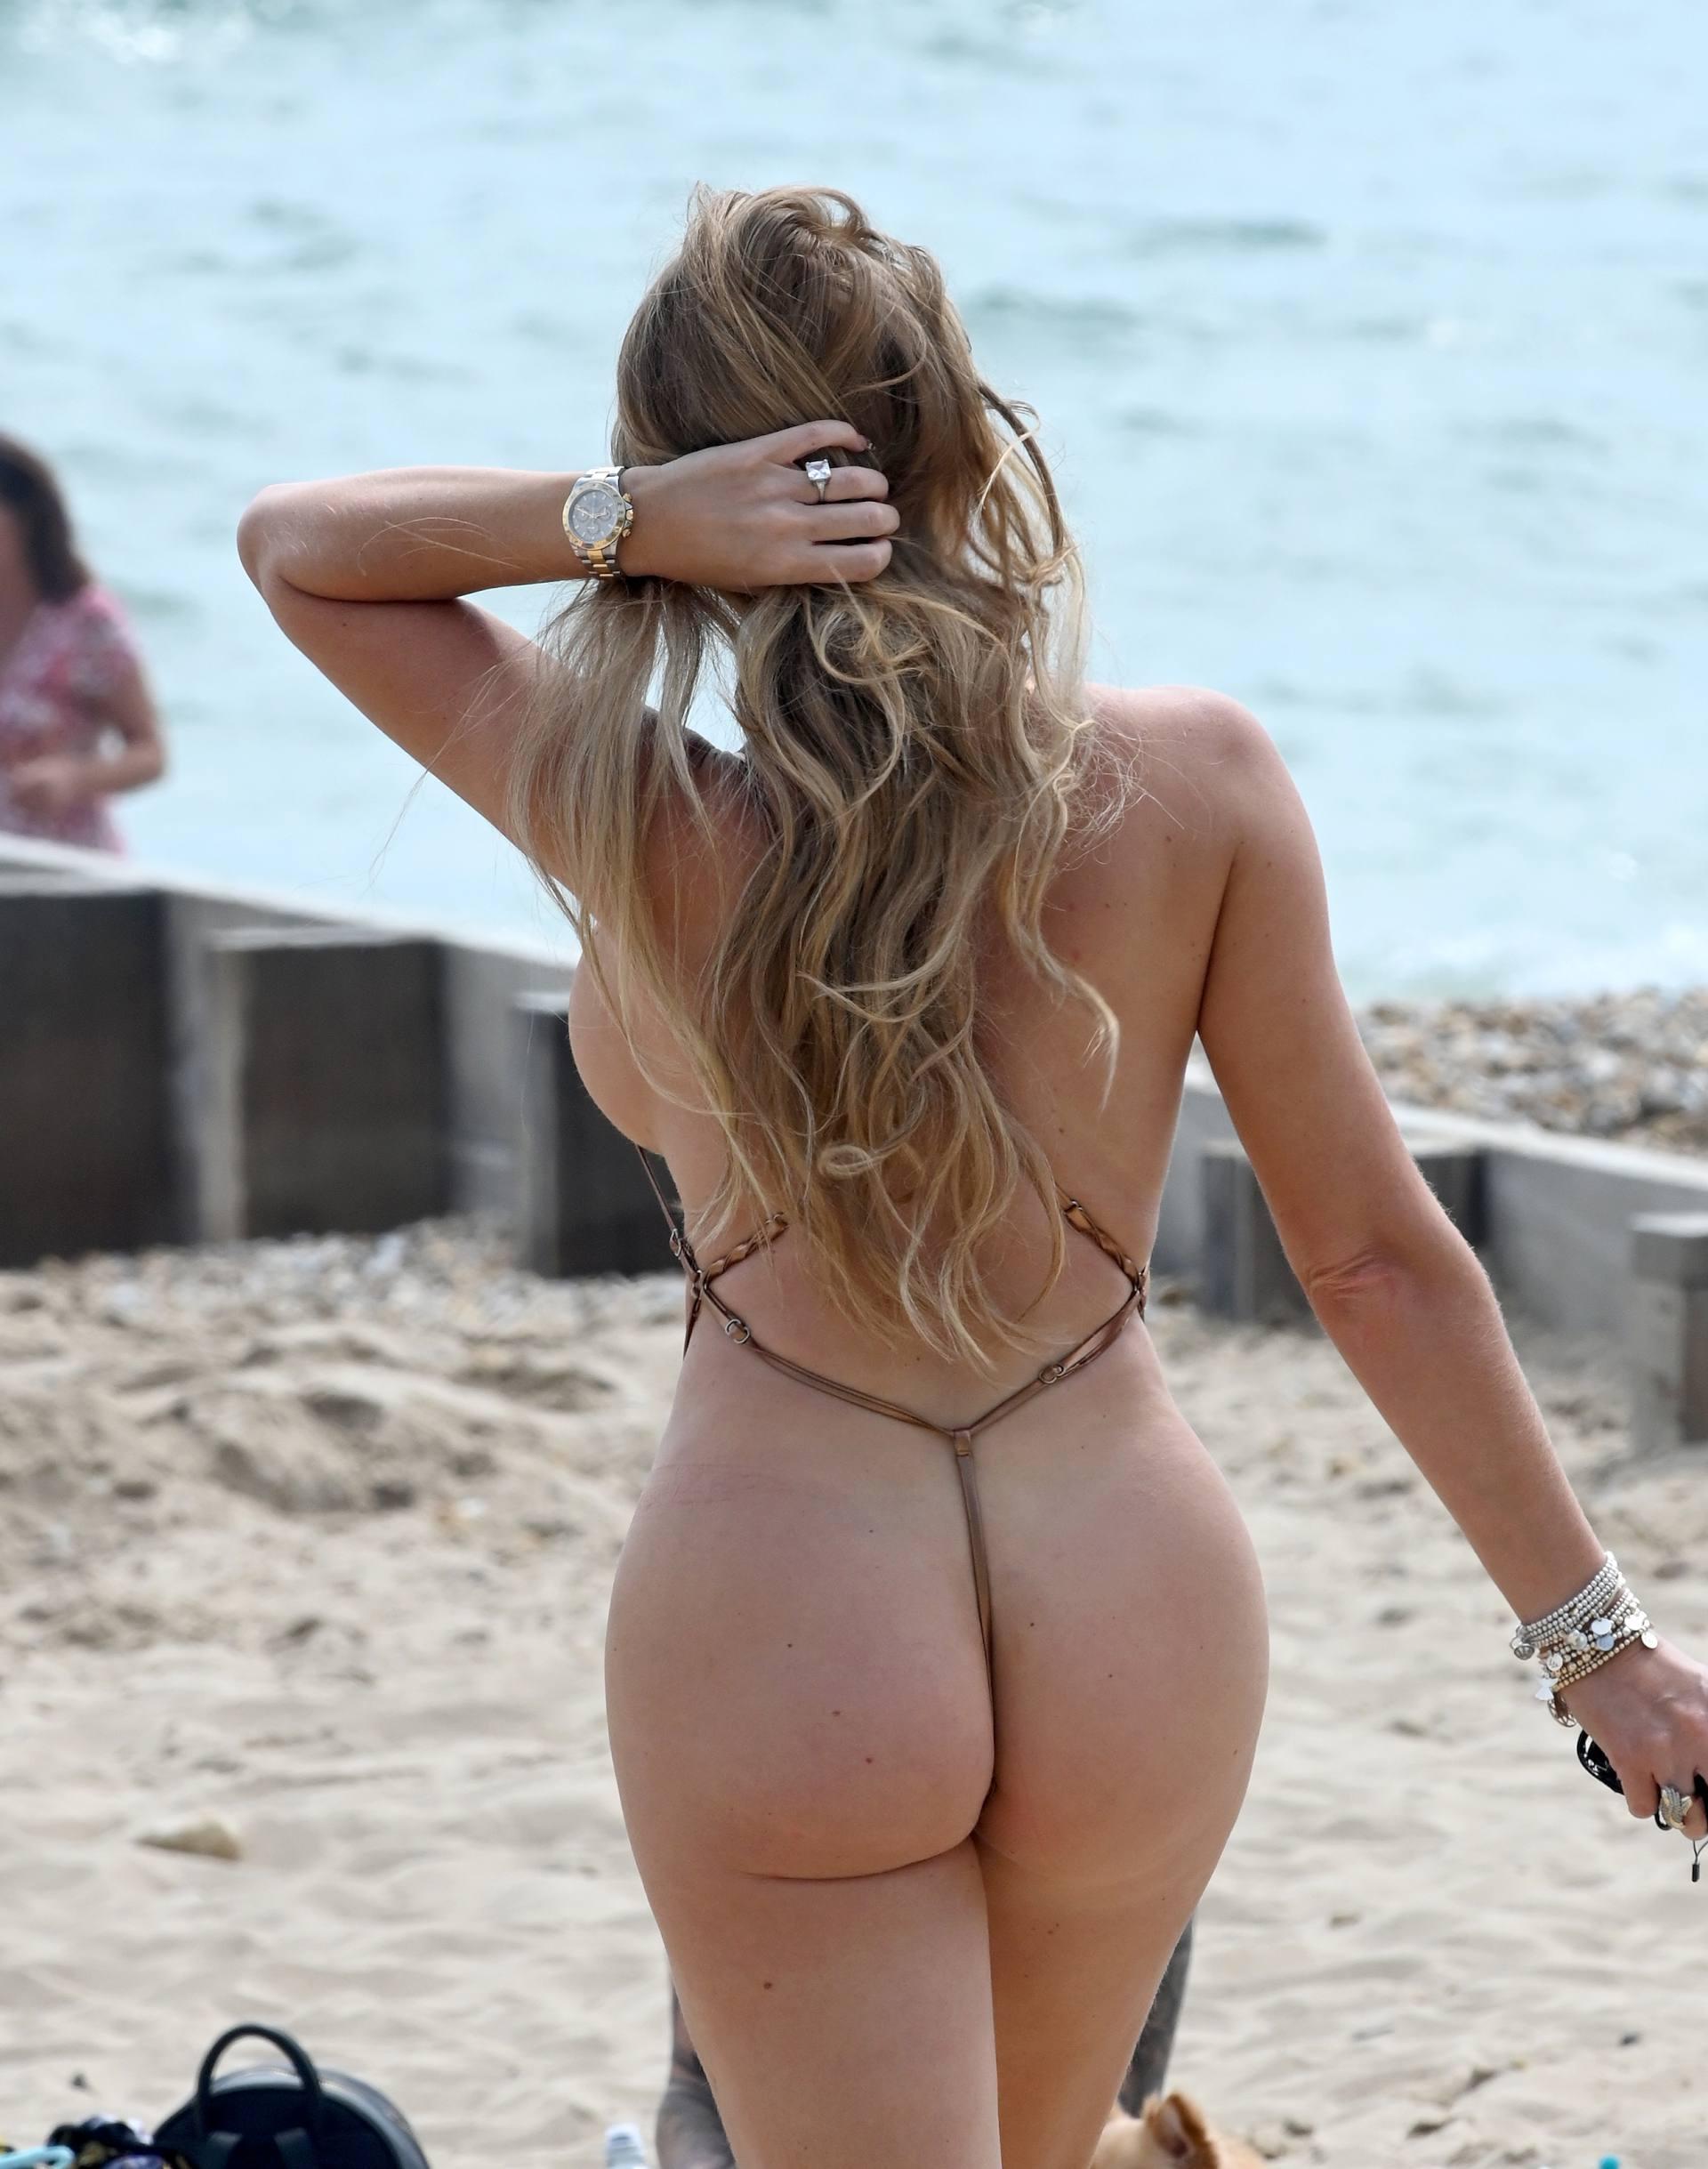 Aisleyne Horgan-Wallace - Big Ass in Tiny G-String Bikini on the Beach in Bournemouth